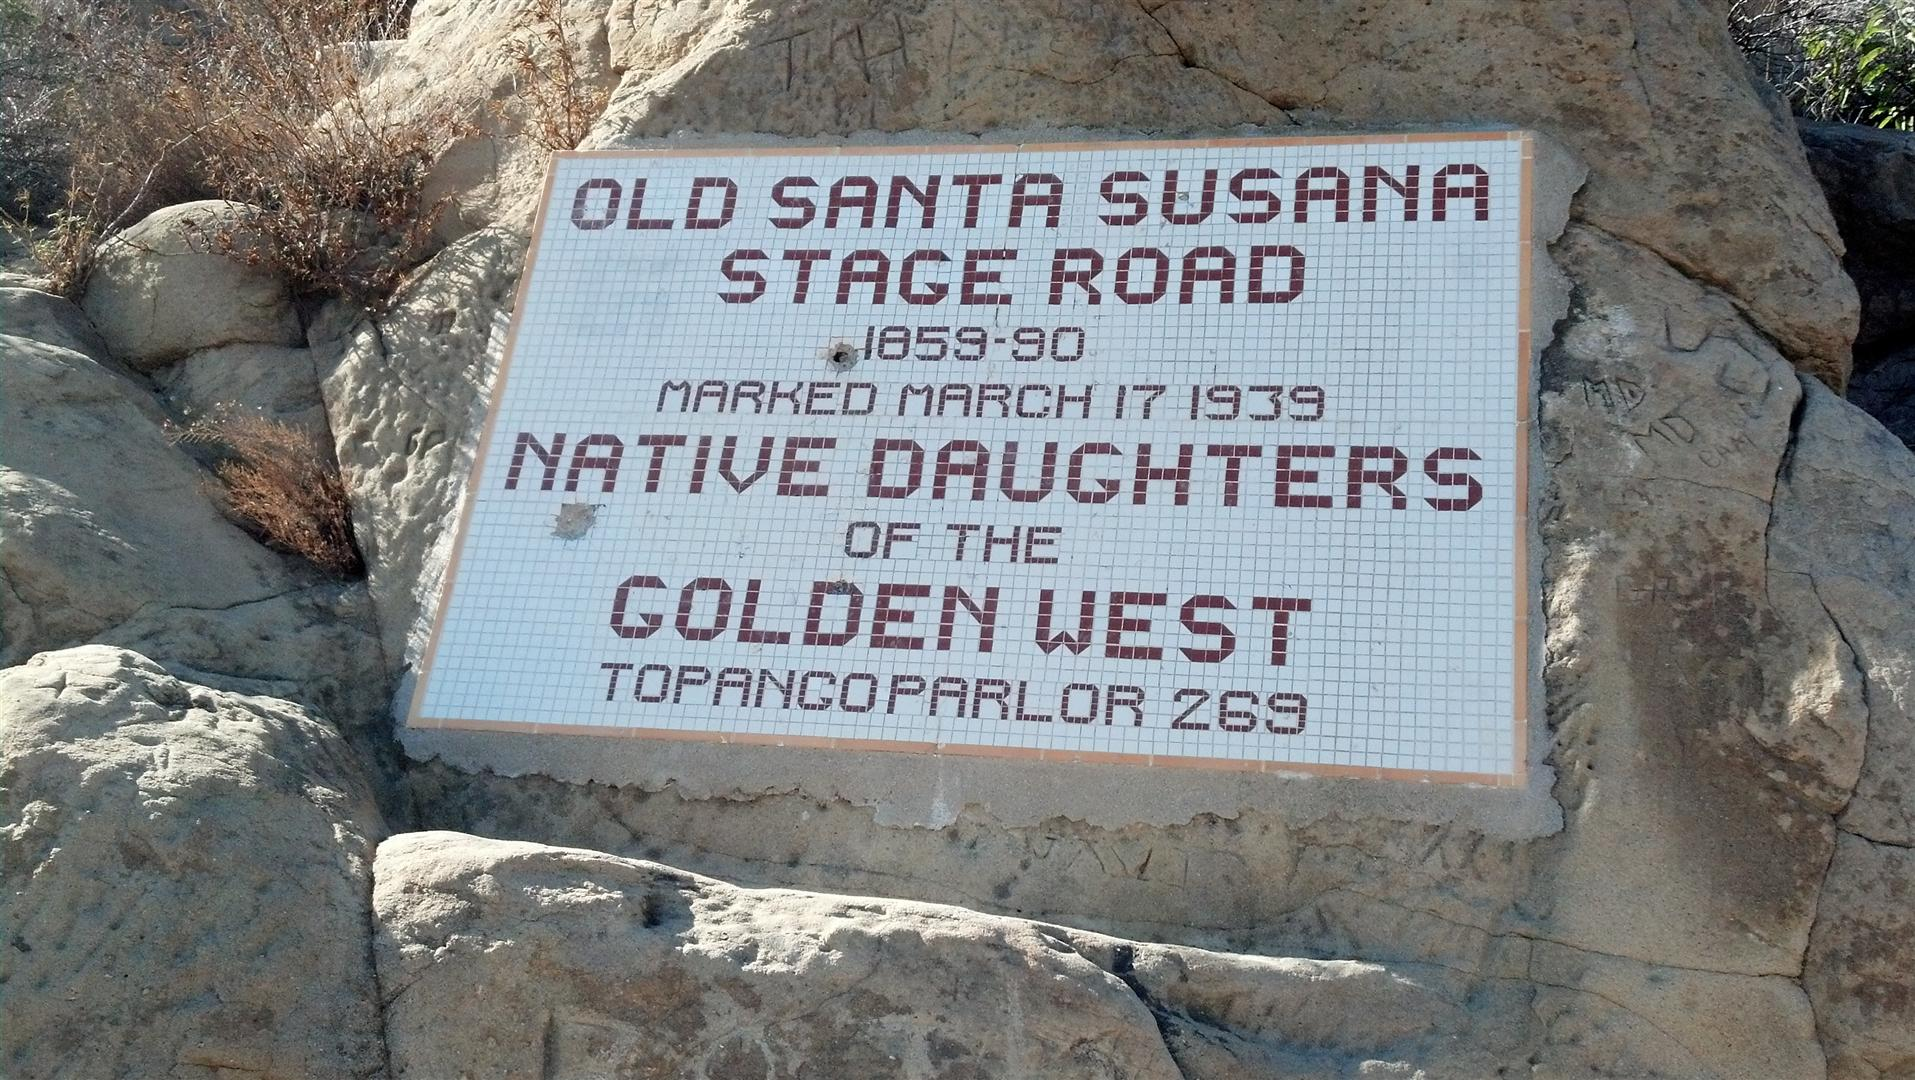 Old Santa Susana Stage Rd Trail - Mountain Biking in Southern CA